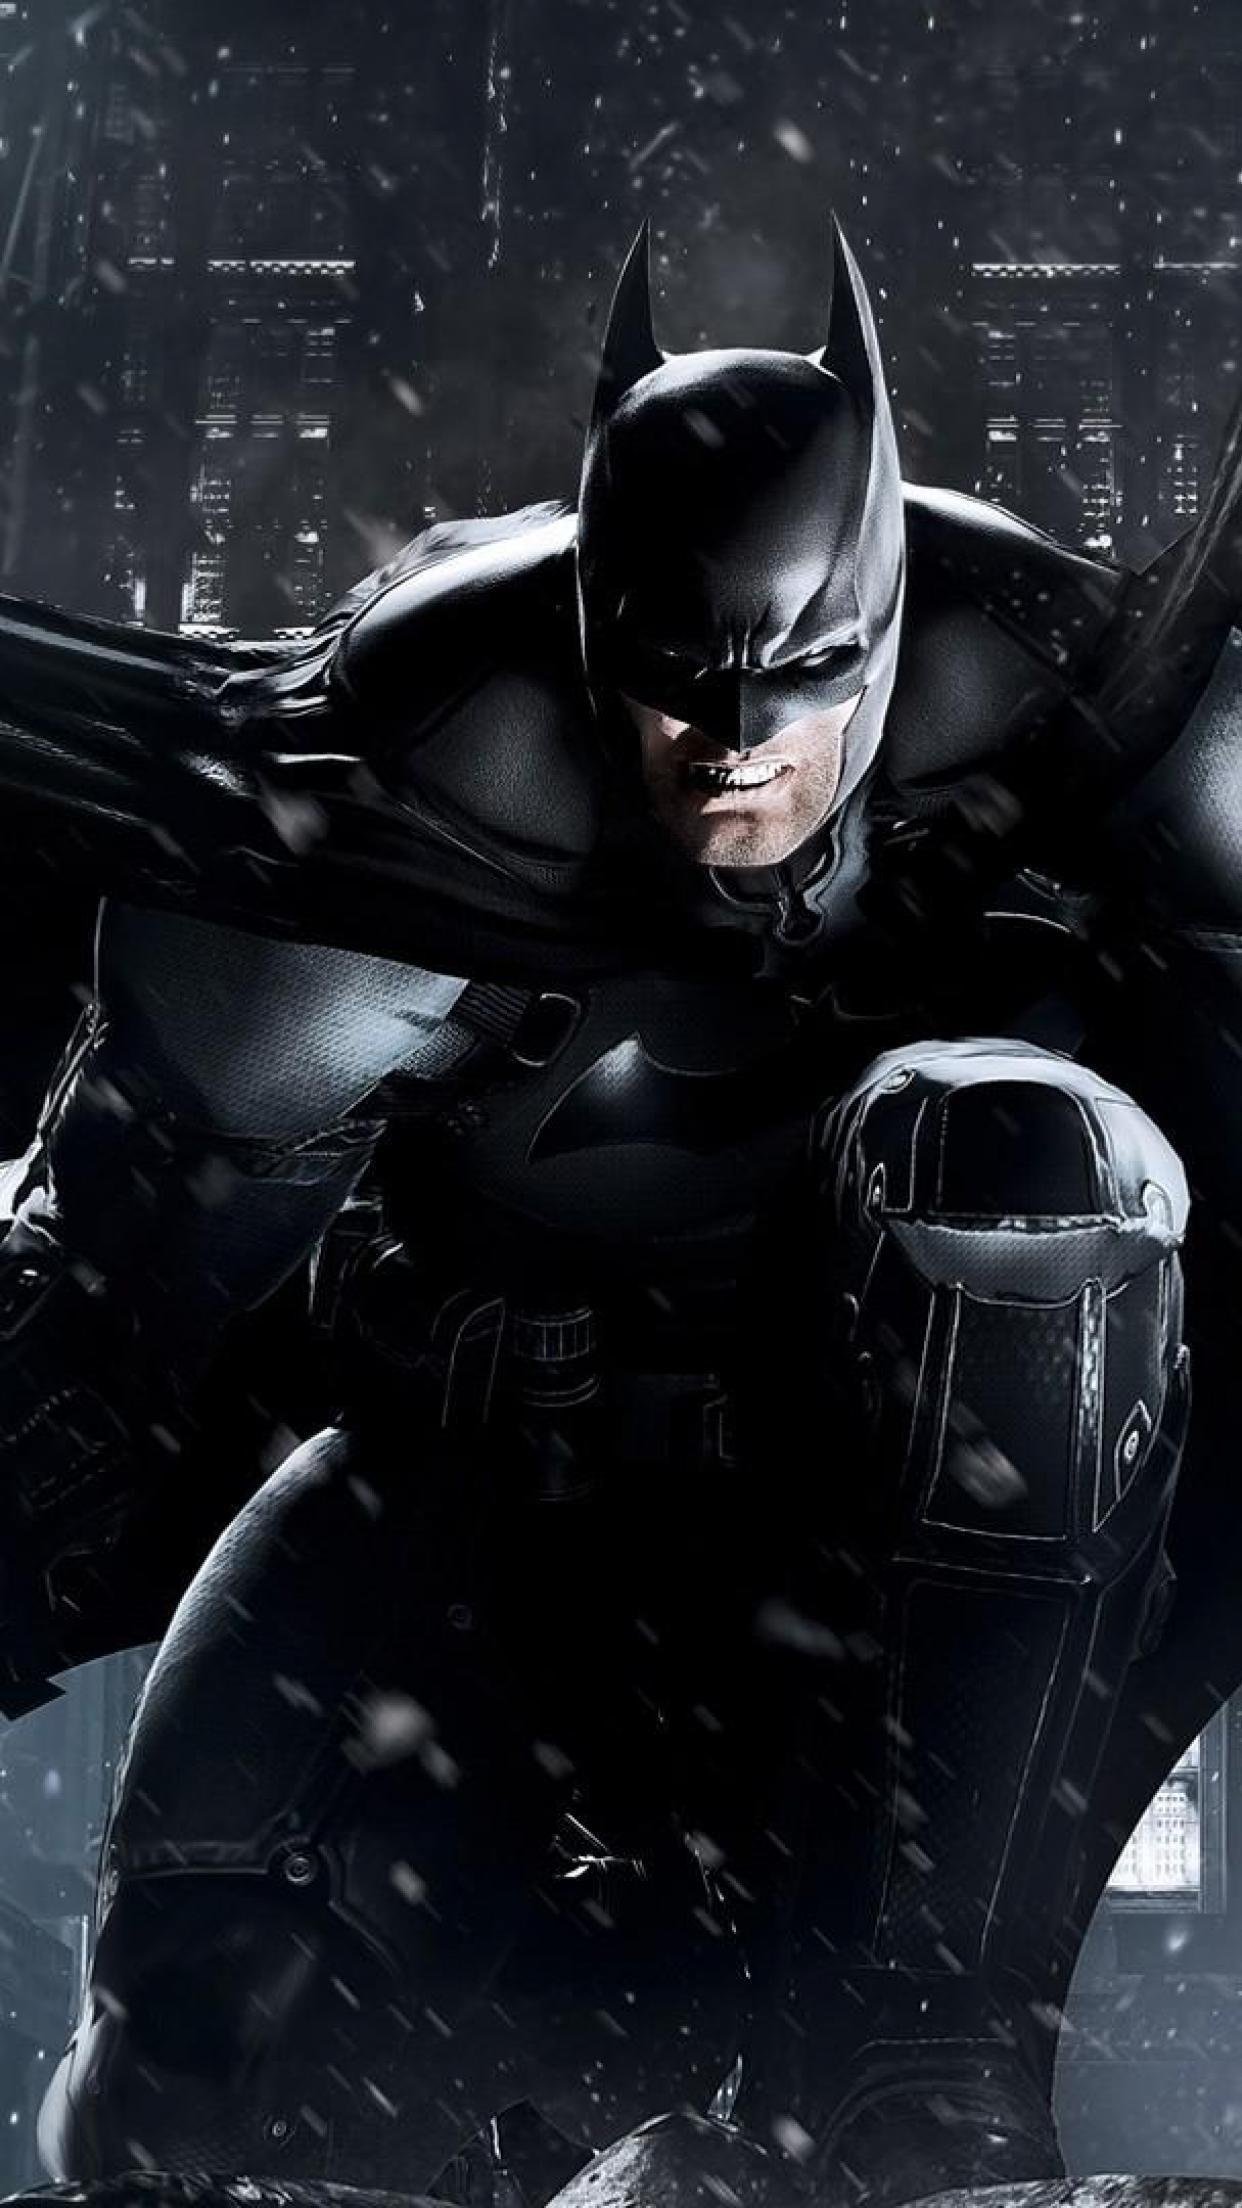 Batman Hd Mobile Wallpapers 52 Find For Free - Batman Dark Hd Iphone , HD Wallpaper & Backgrounds